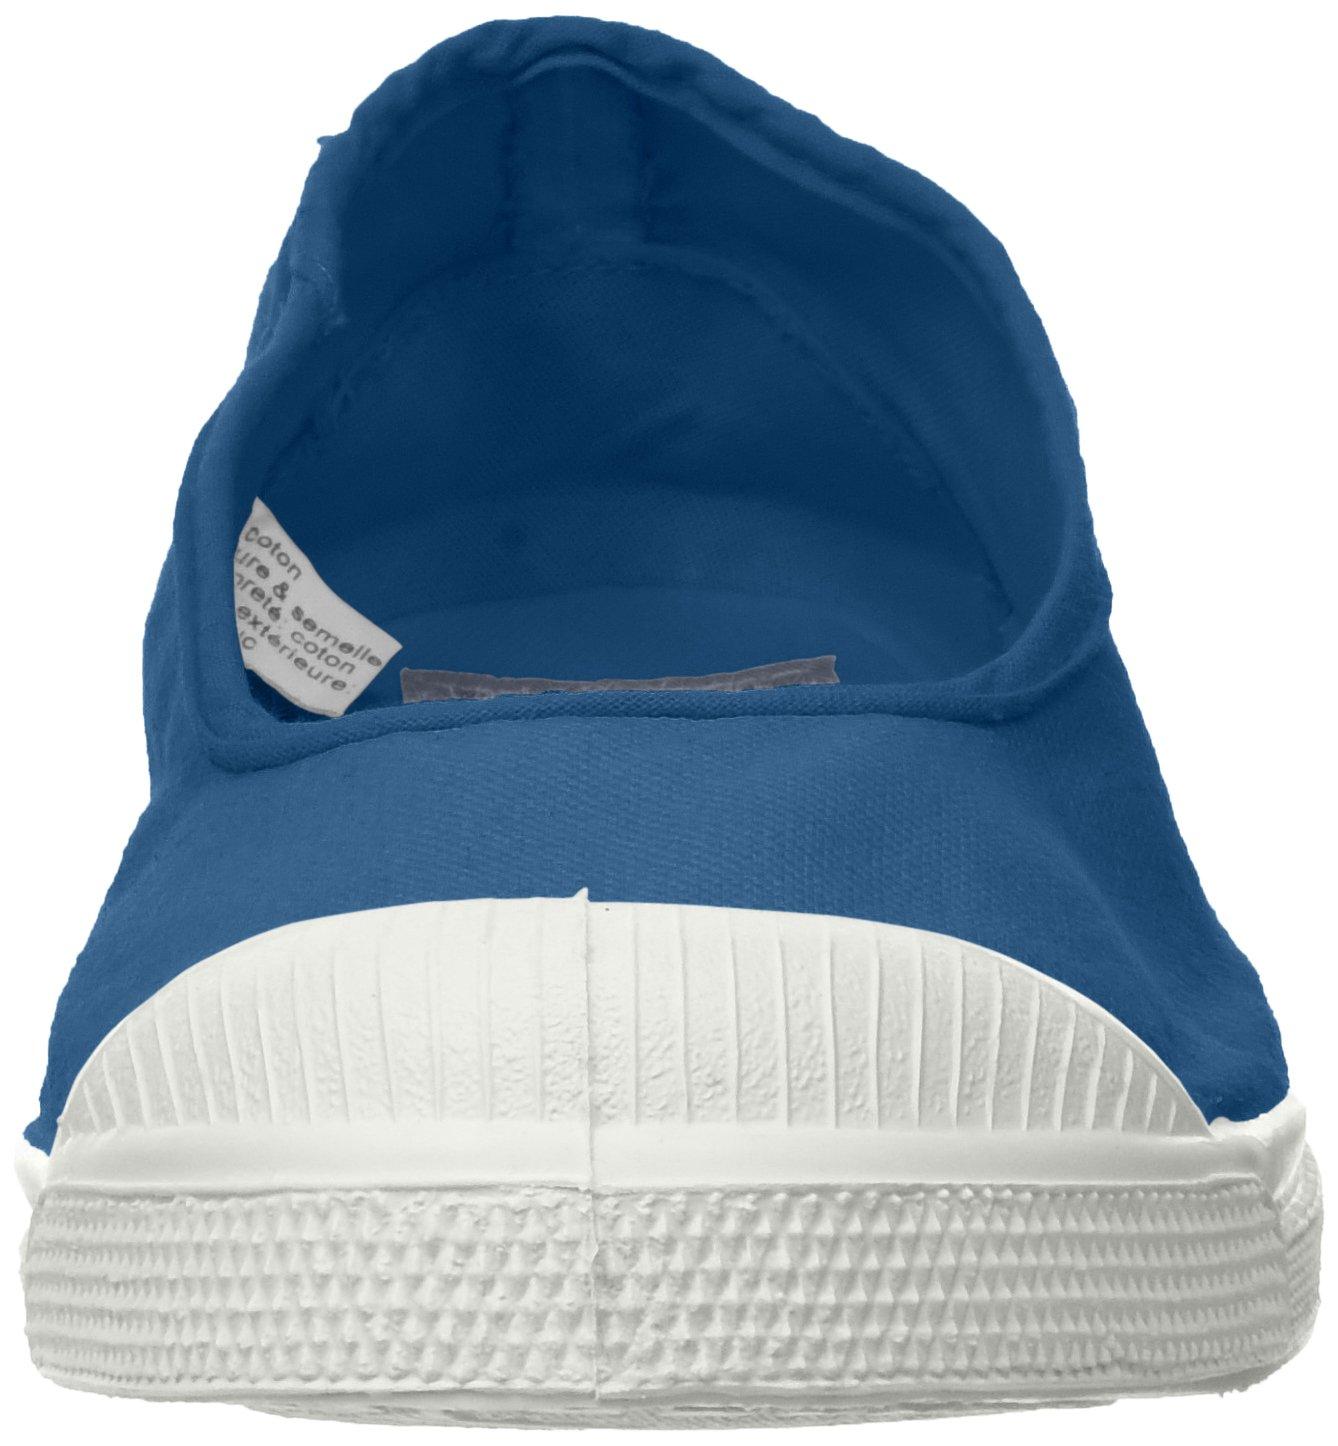 Bensimon Damen (Bleu) Tennis Ballerine Sneaker Blau (Bleu) Damen 6f2af0